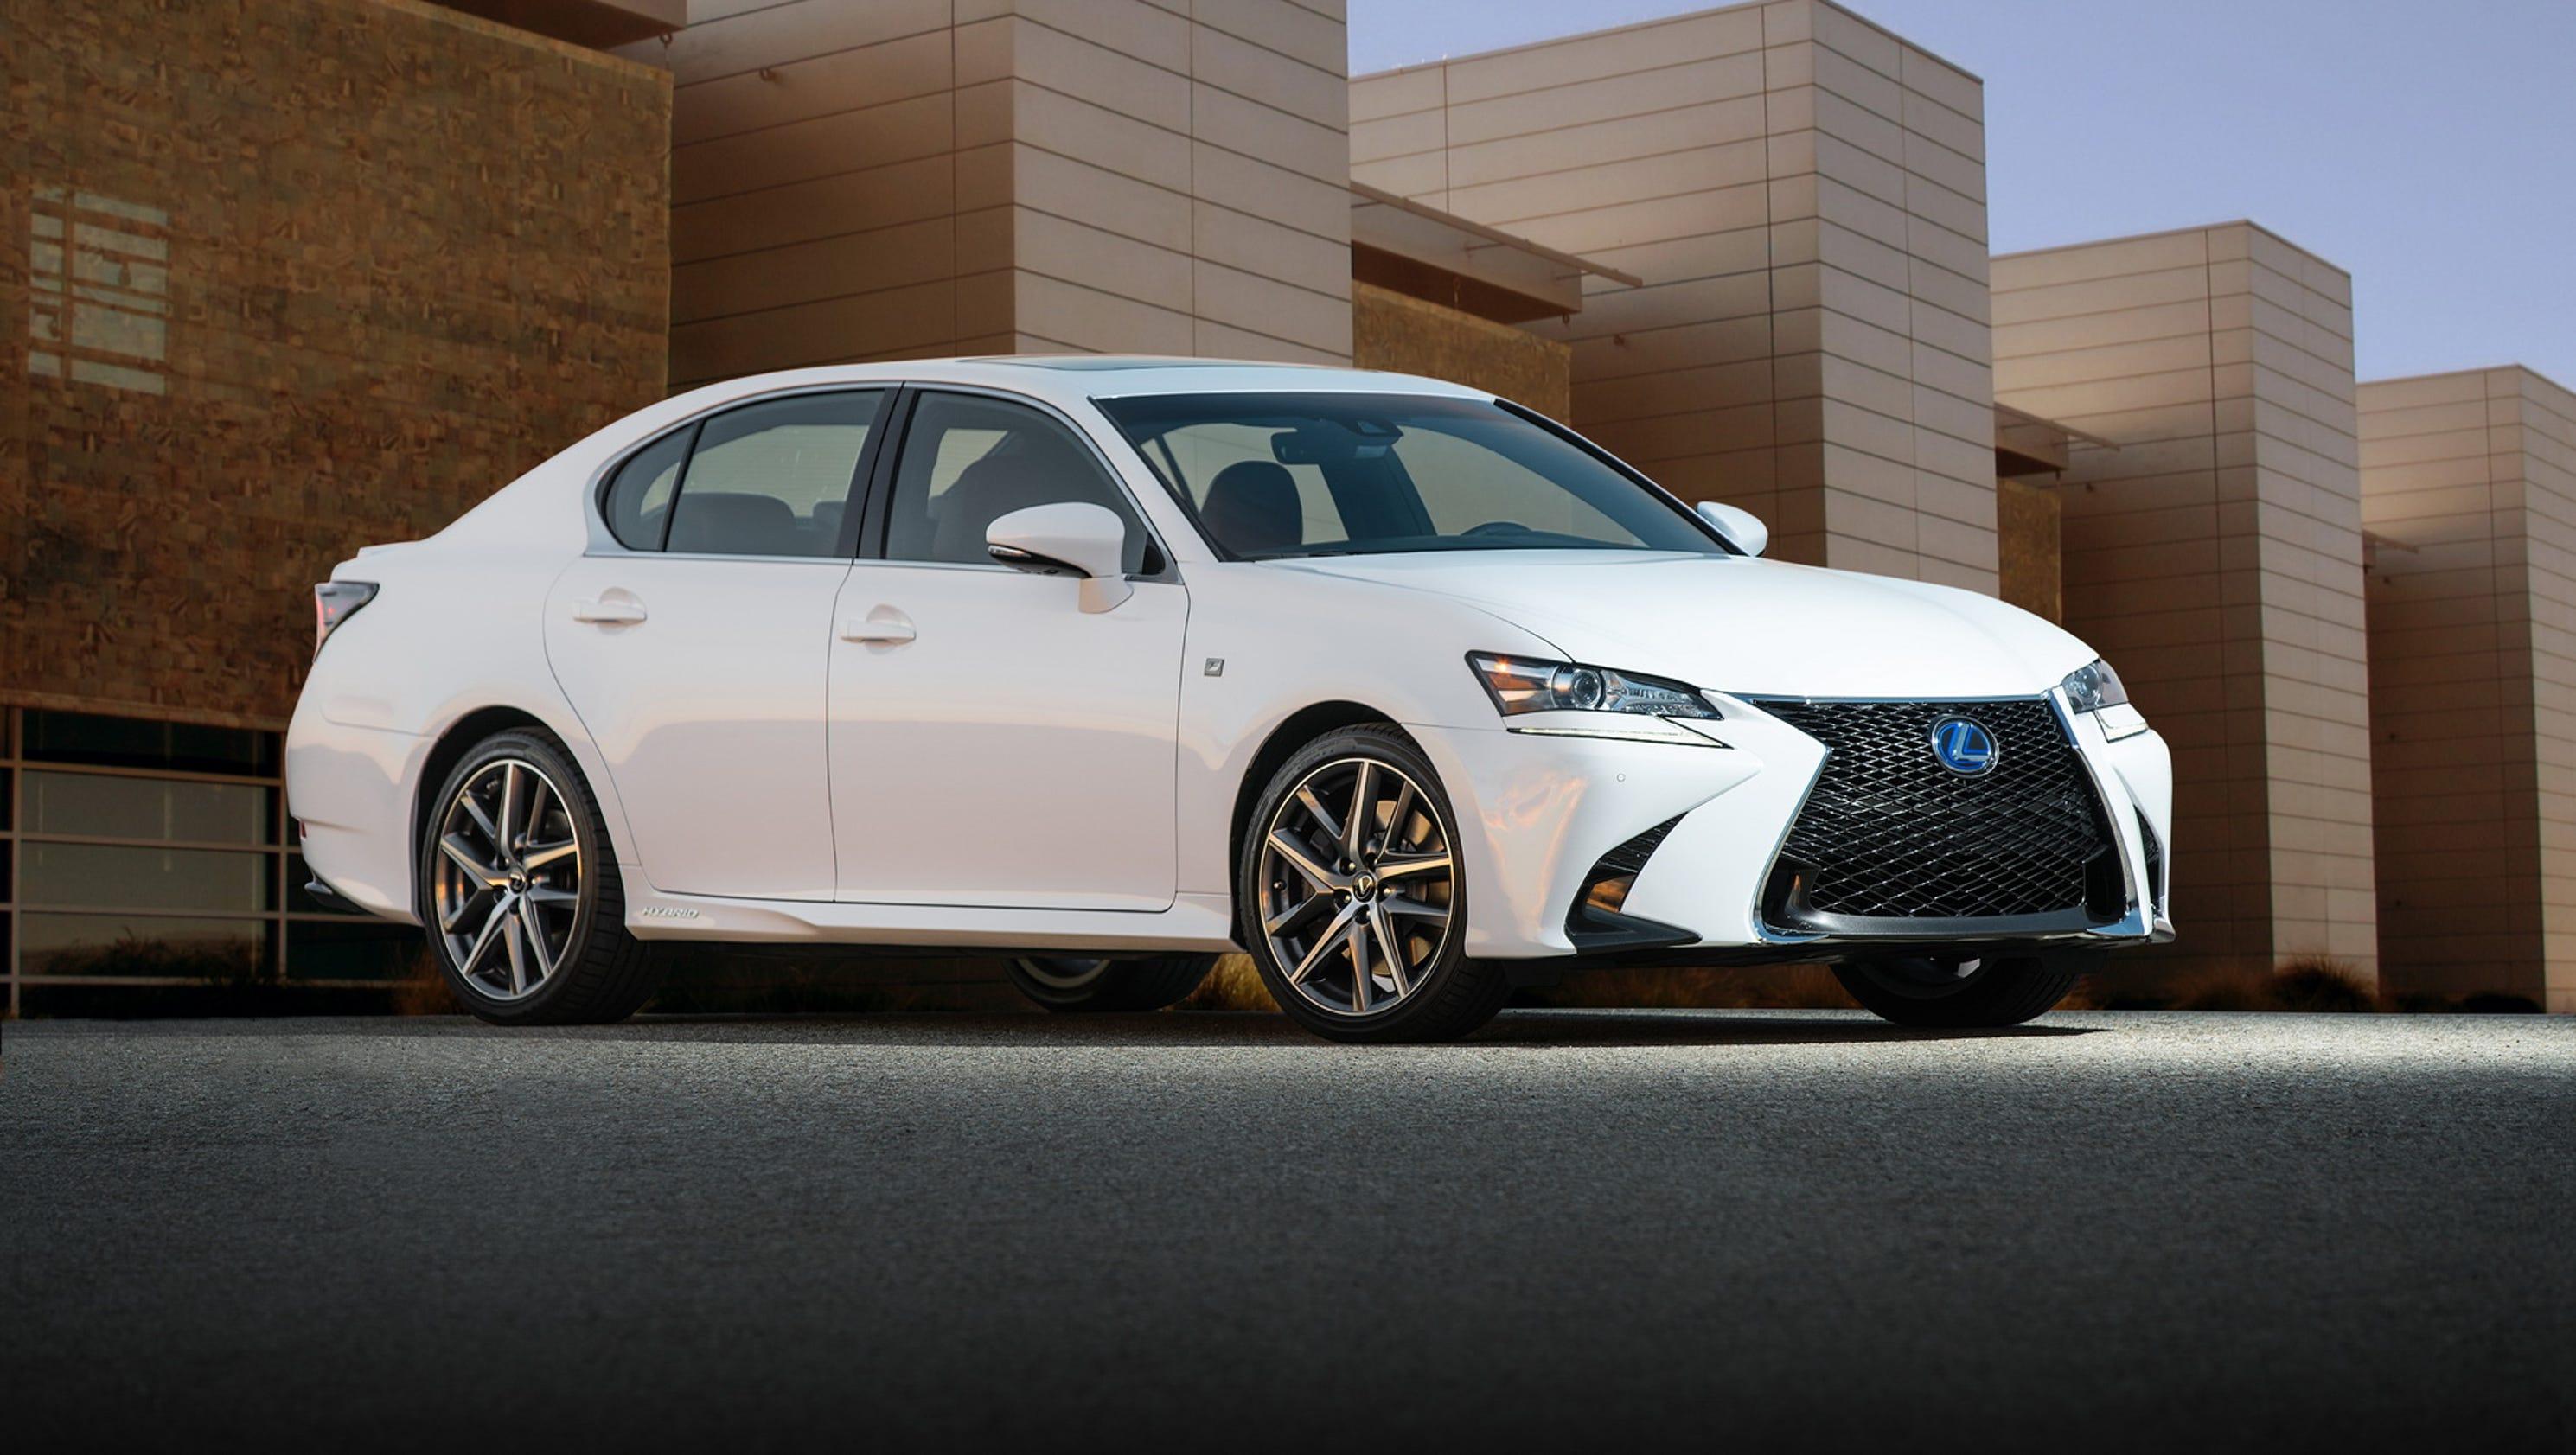 only auto hybrid hs worlds vehicle lexus news first s sedan luxury world